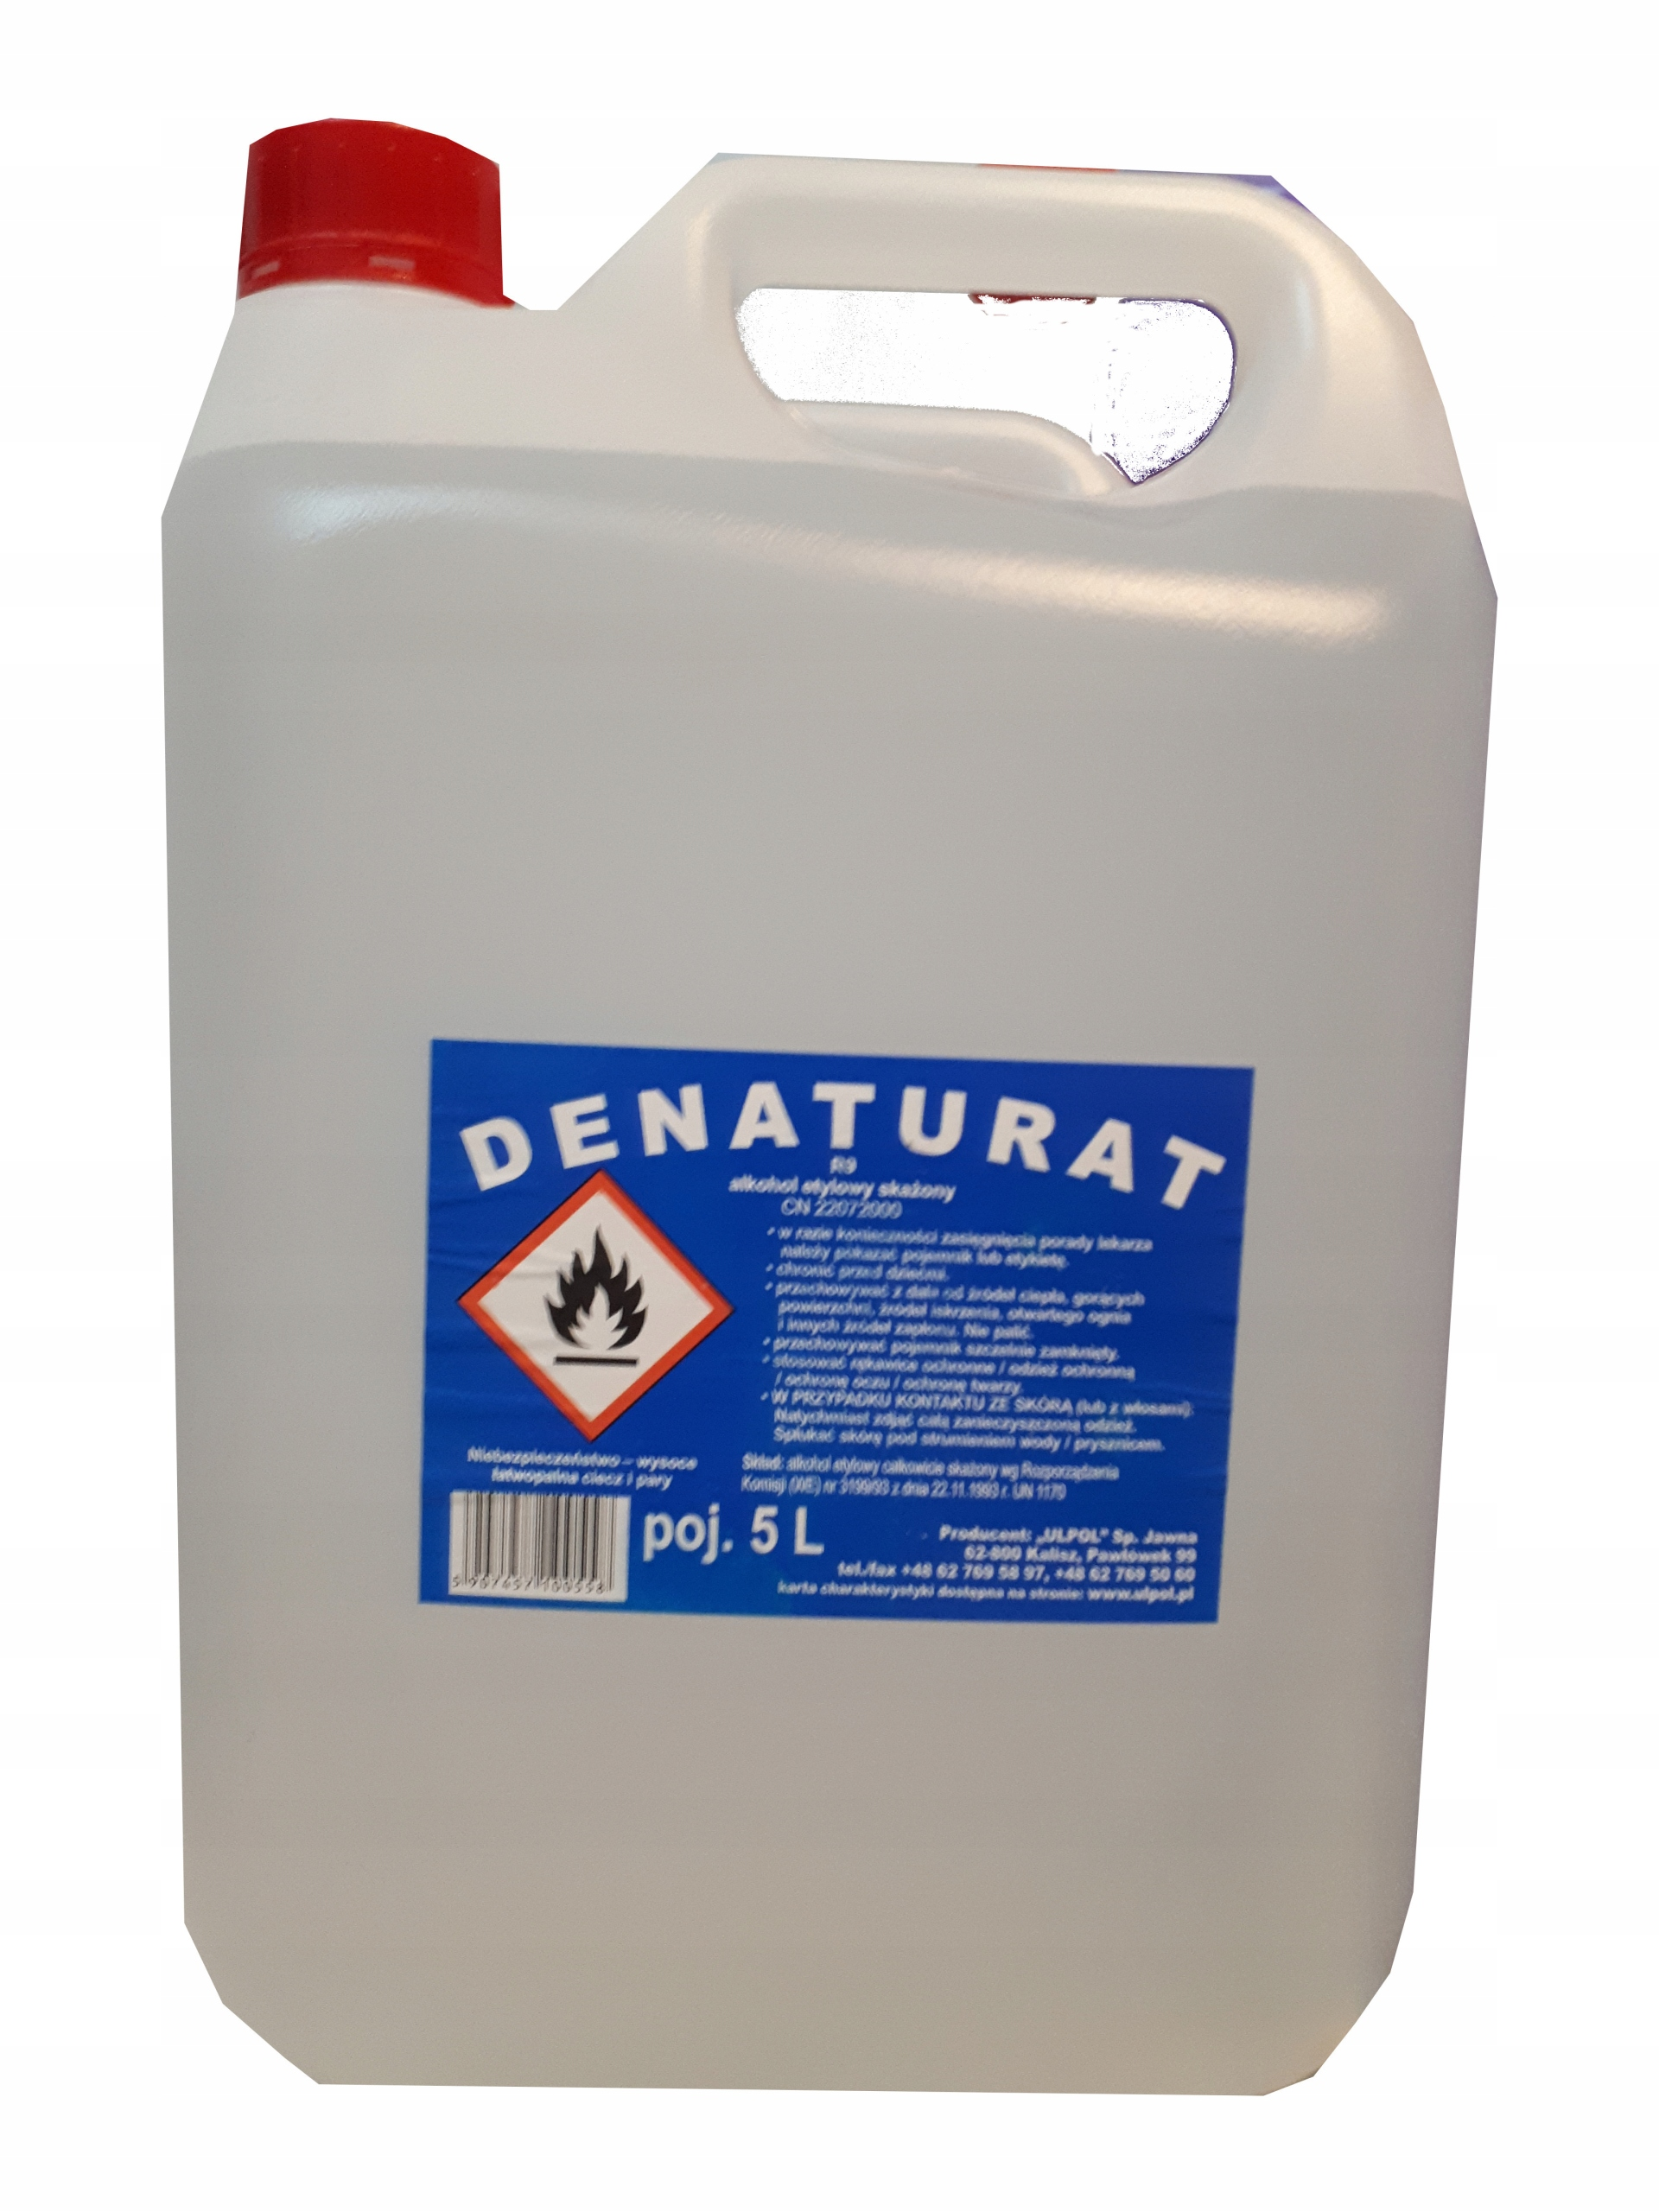 Denaturat 92% rozpuszczalnik bezbarwny/fiolet 5L!